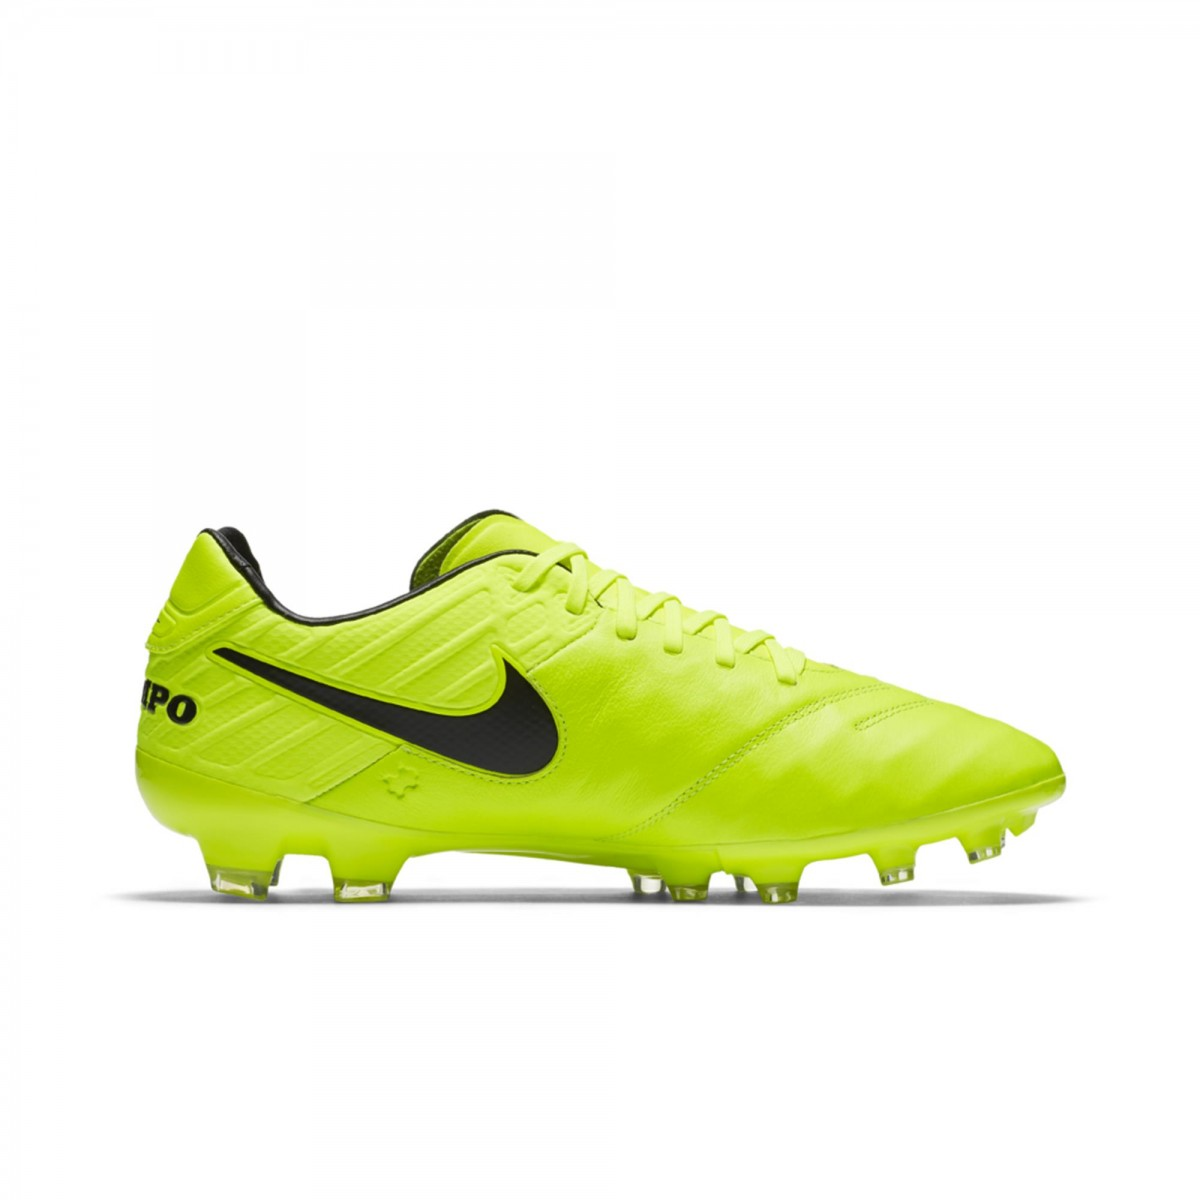 5935cbe49d Chuteira Campo Nike Tiempo Legacy II FG 819218-707 Verde